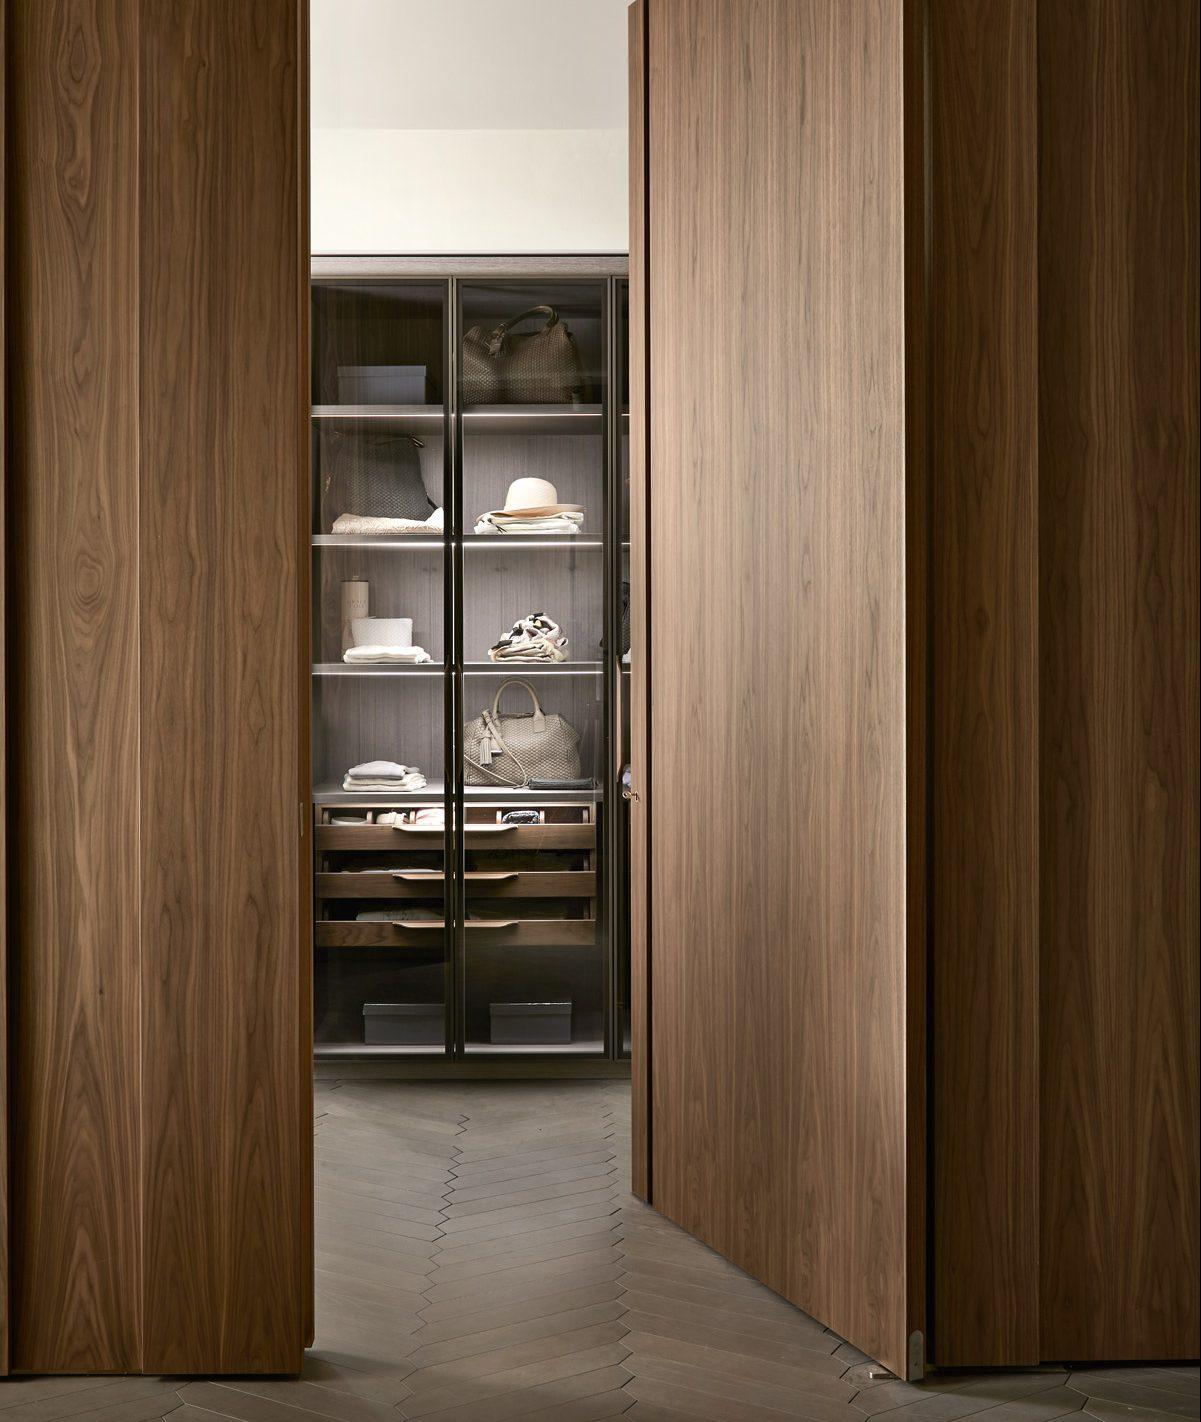 SBID Awards Sponsor Foglie d'Oro interior image with wood flooring